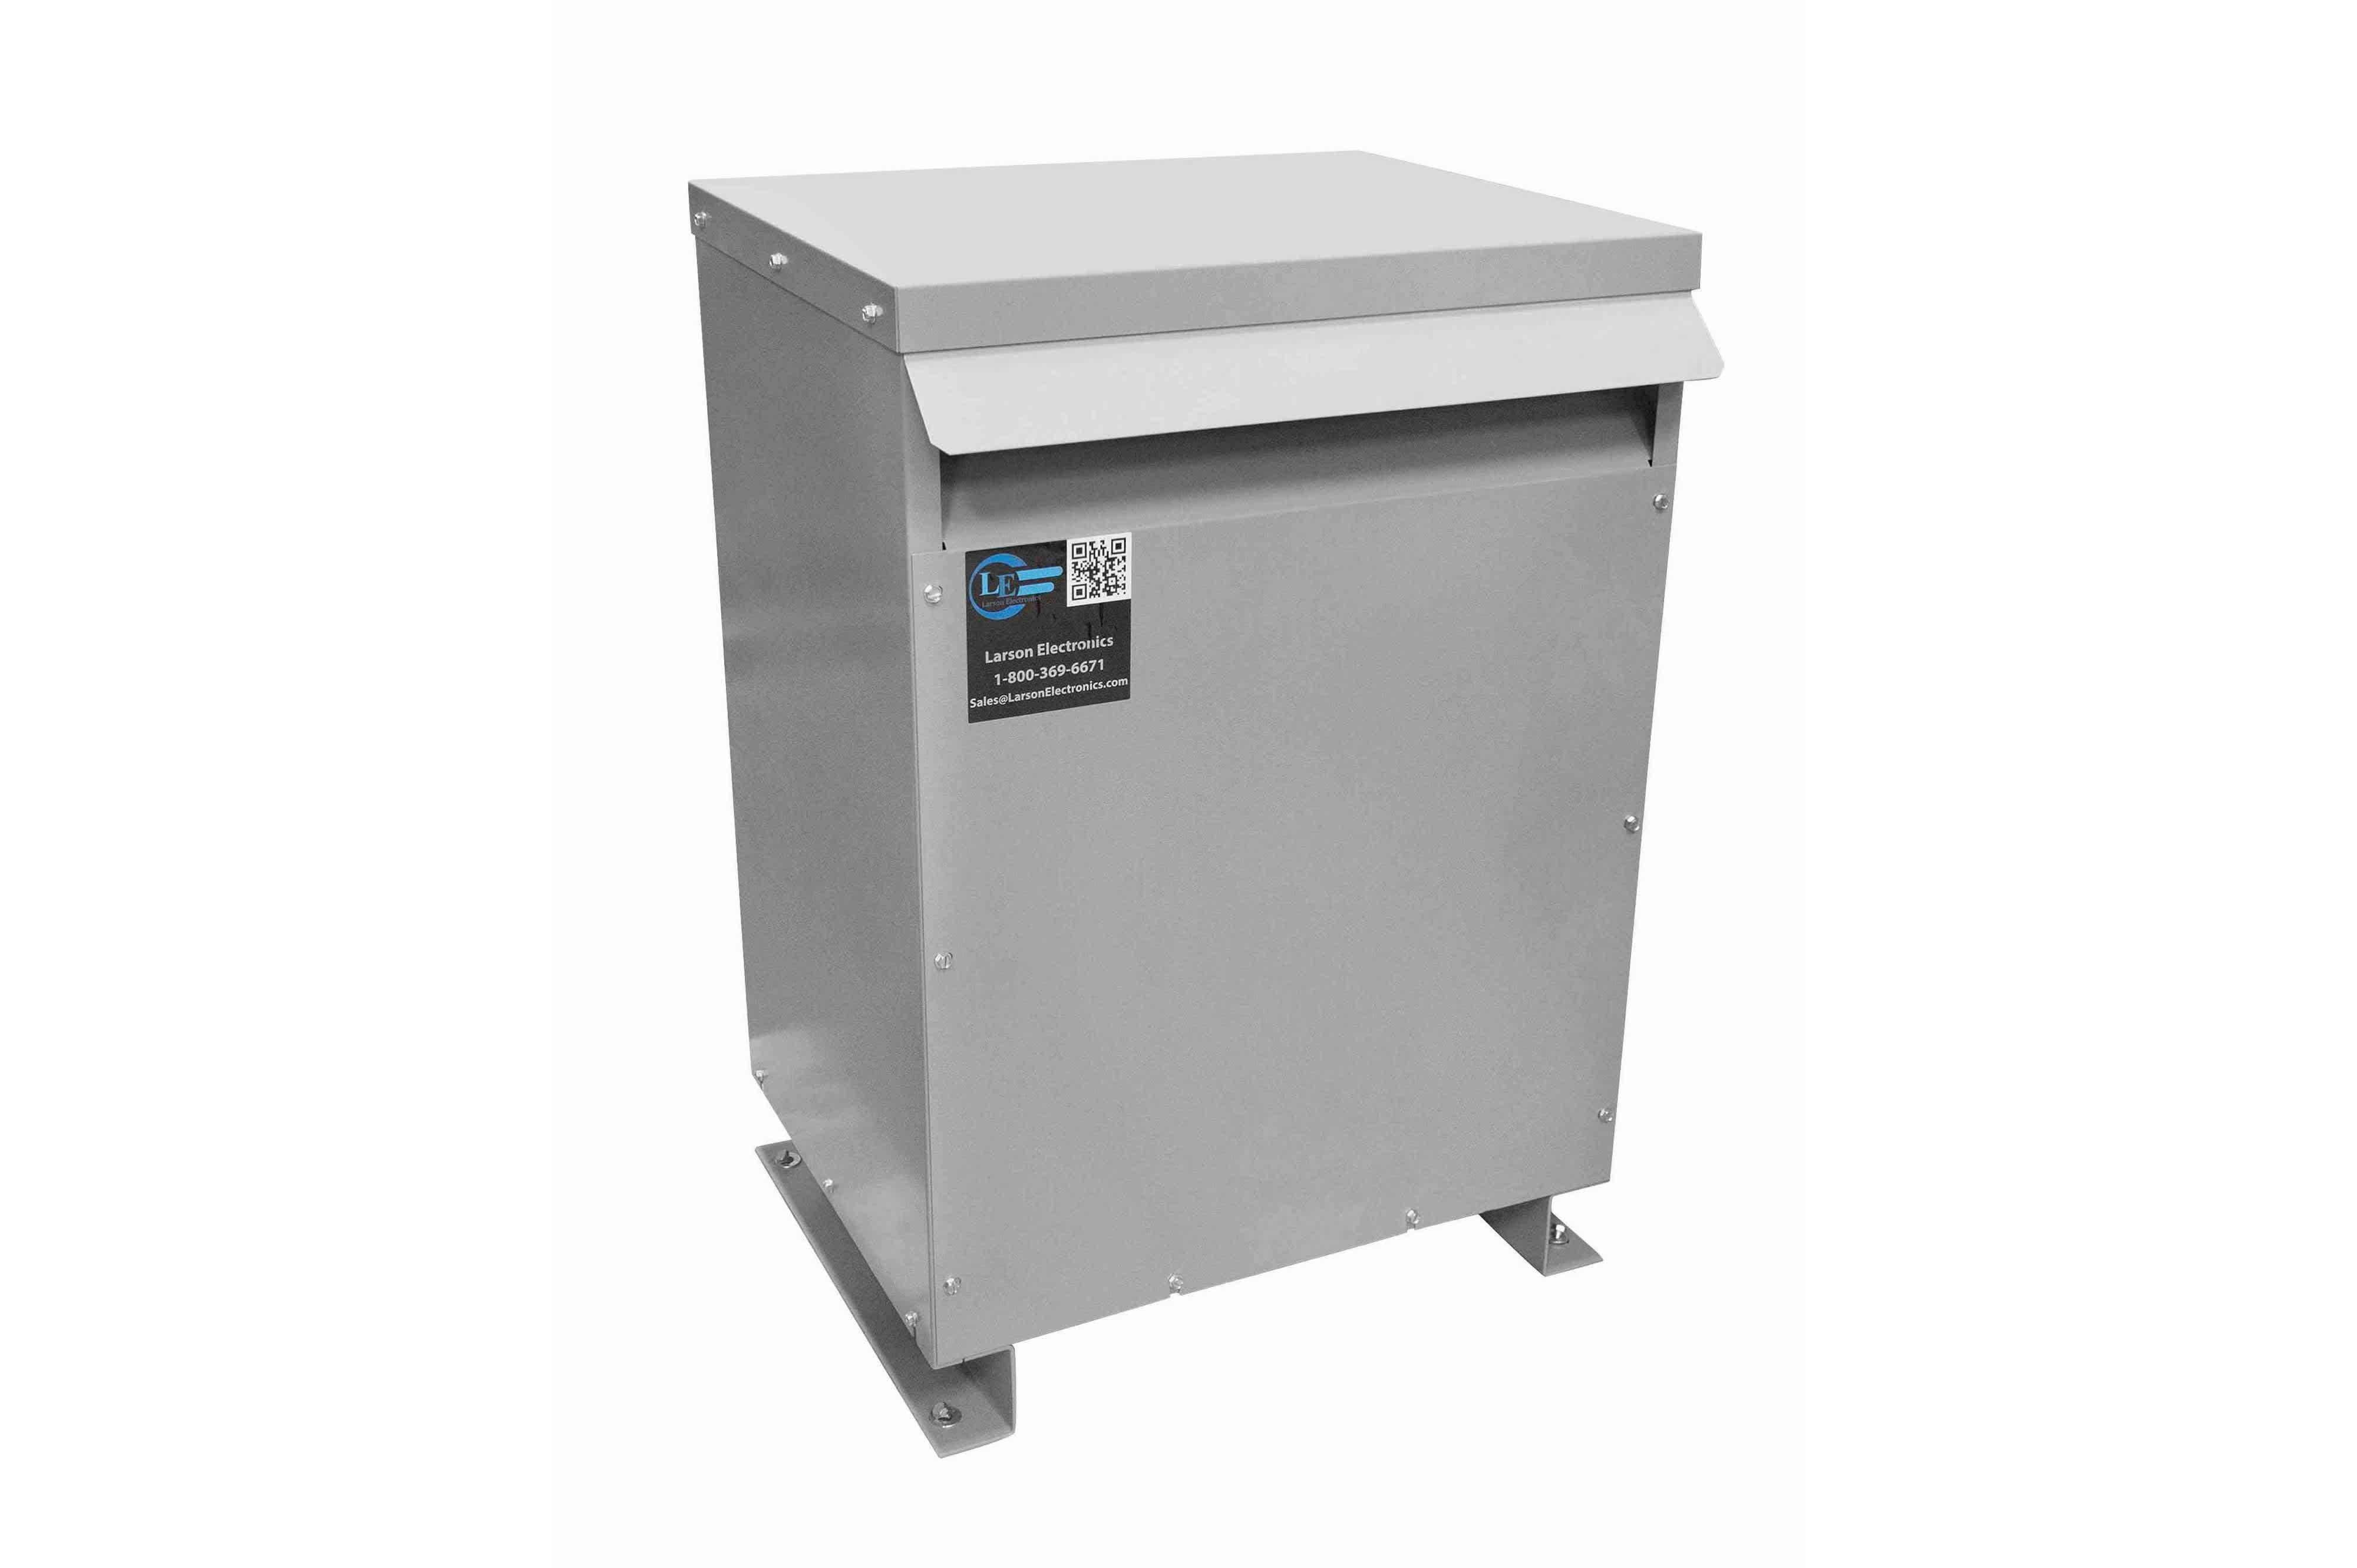 13 kVA 3PH Isolation Transformer, 230V Wye Primary, 208V Delta Secondary, N3R, Ventilated, 60 Hz